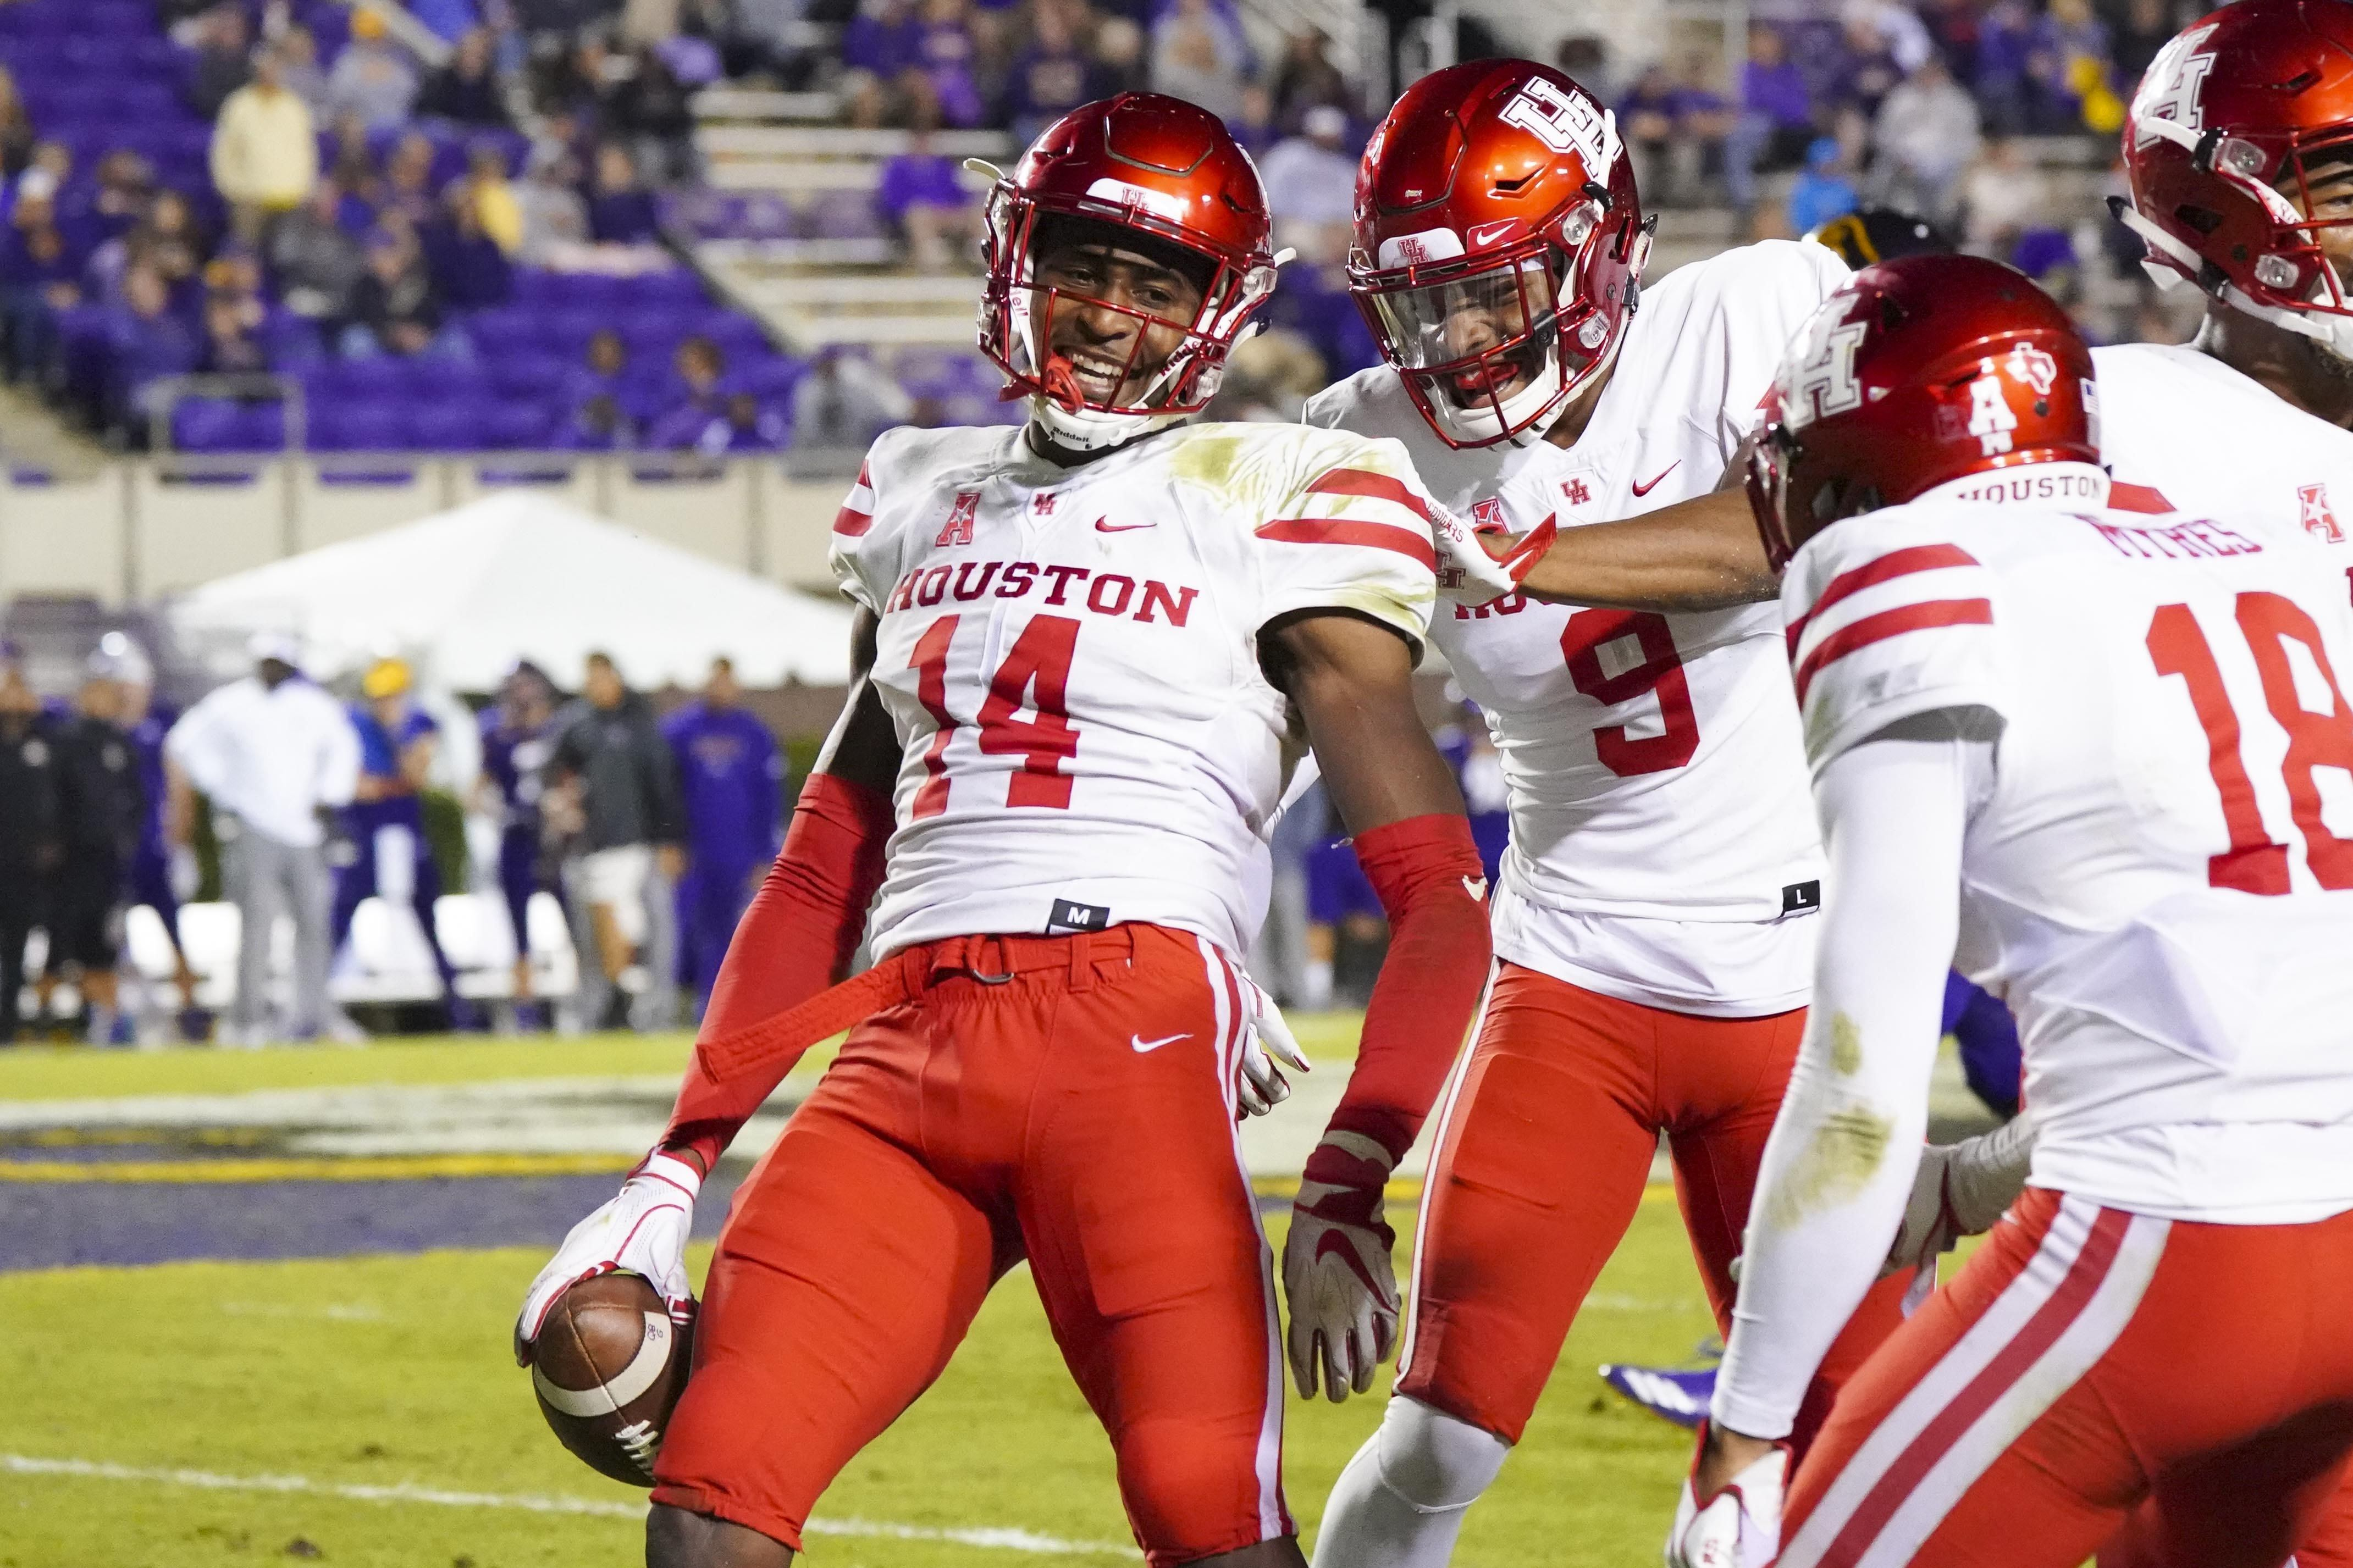 Cowboys Draft: Film Study on Houston Cougars CB Isaiah Johnson